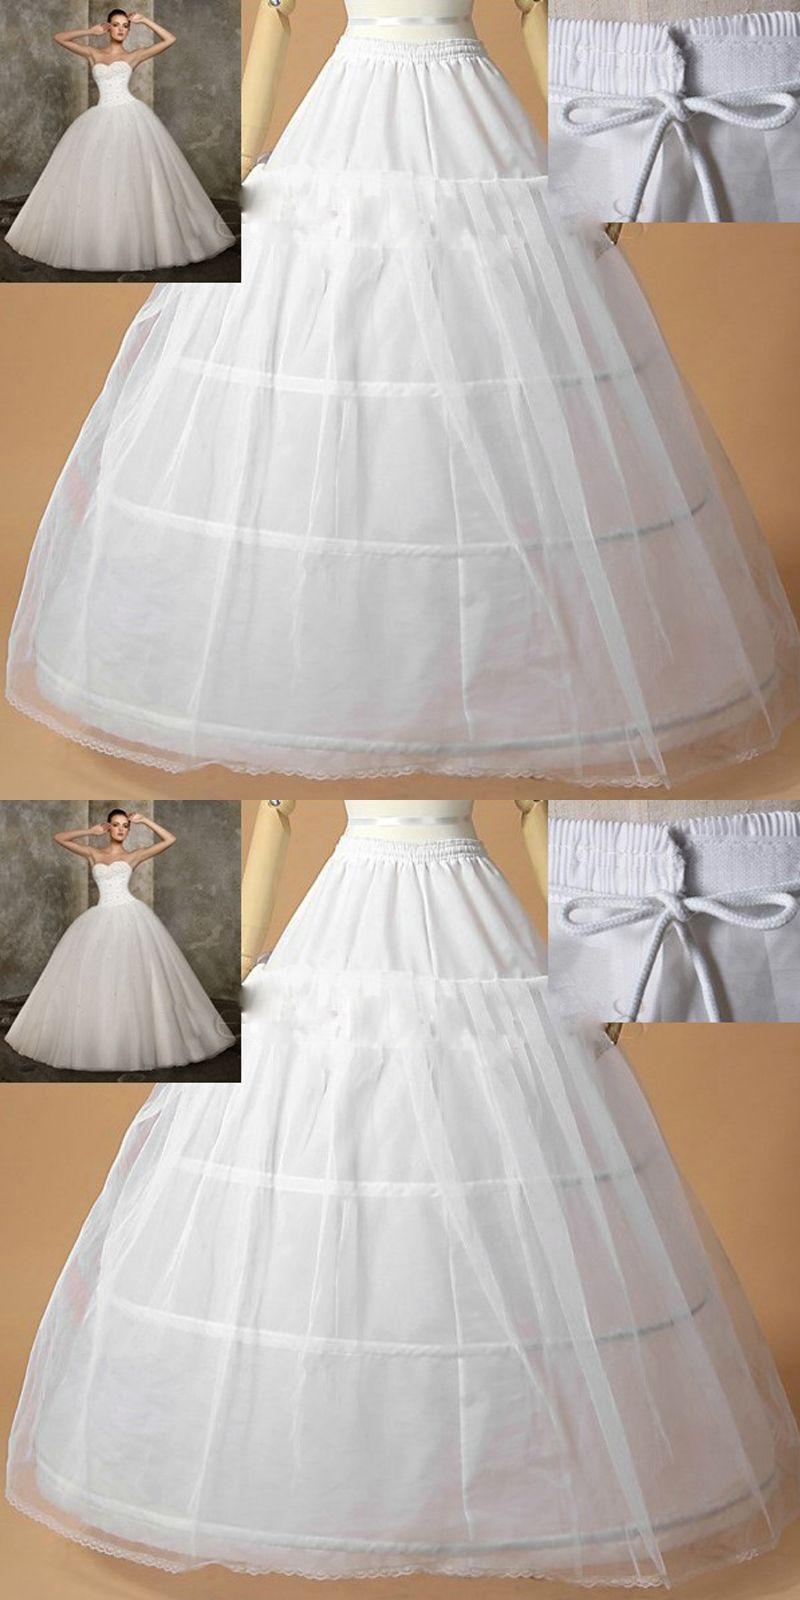 Hot Sale Edge 3 Hoop Petticoat Underskirt For Ball Gown Wedding ...